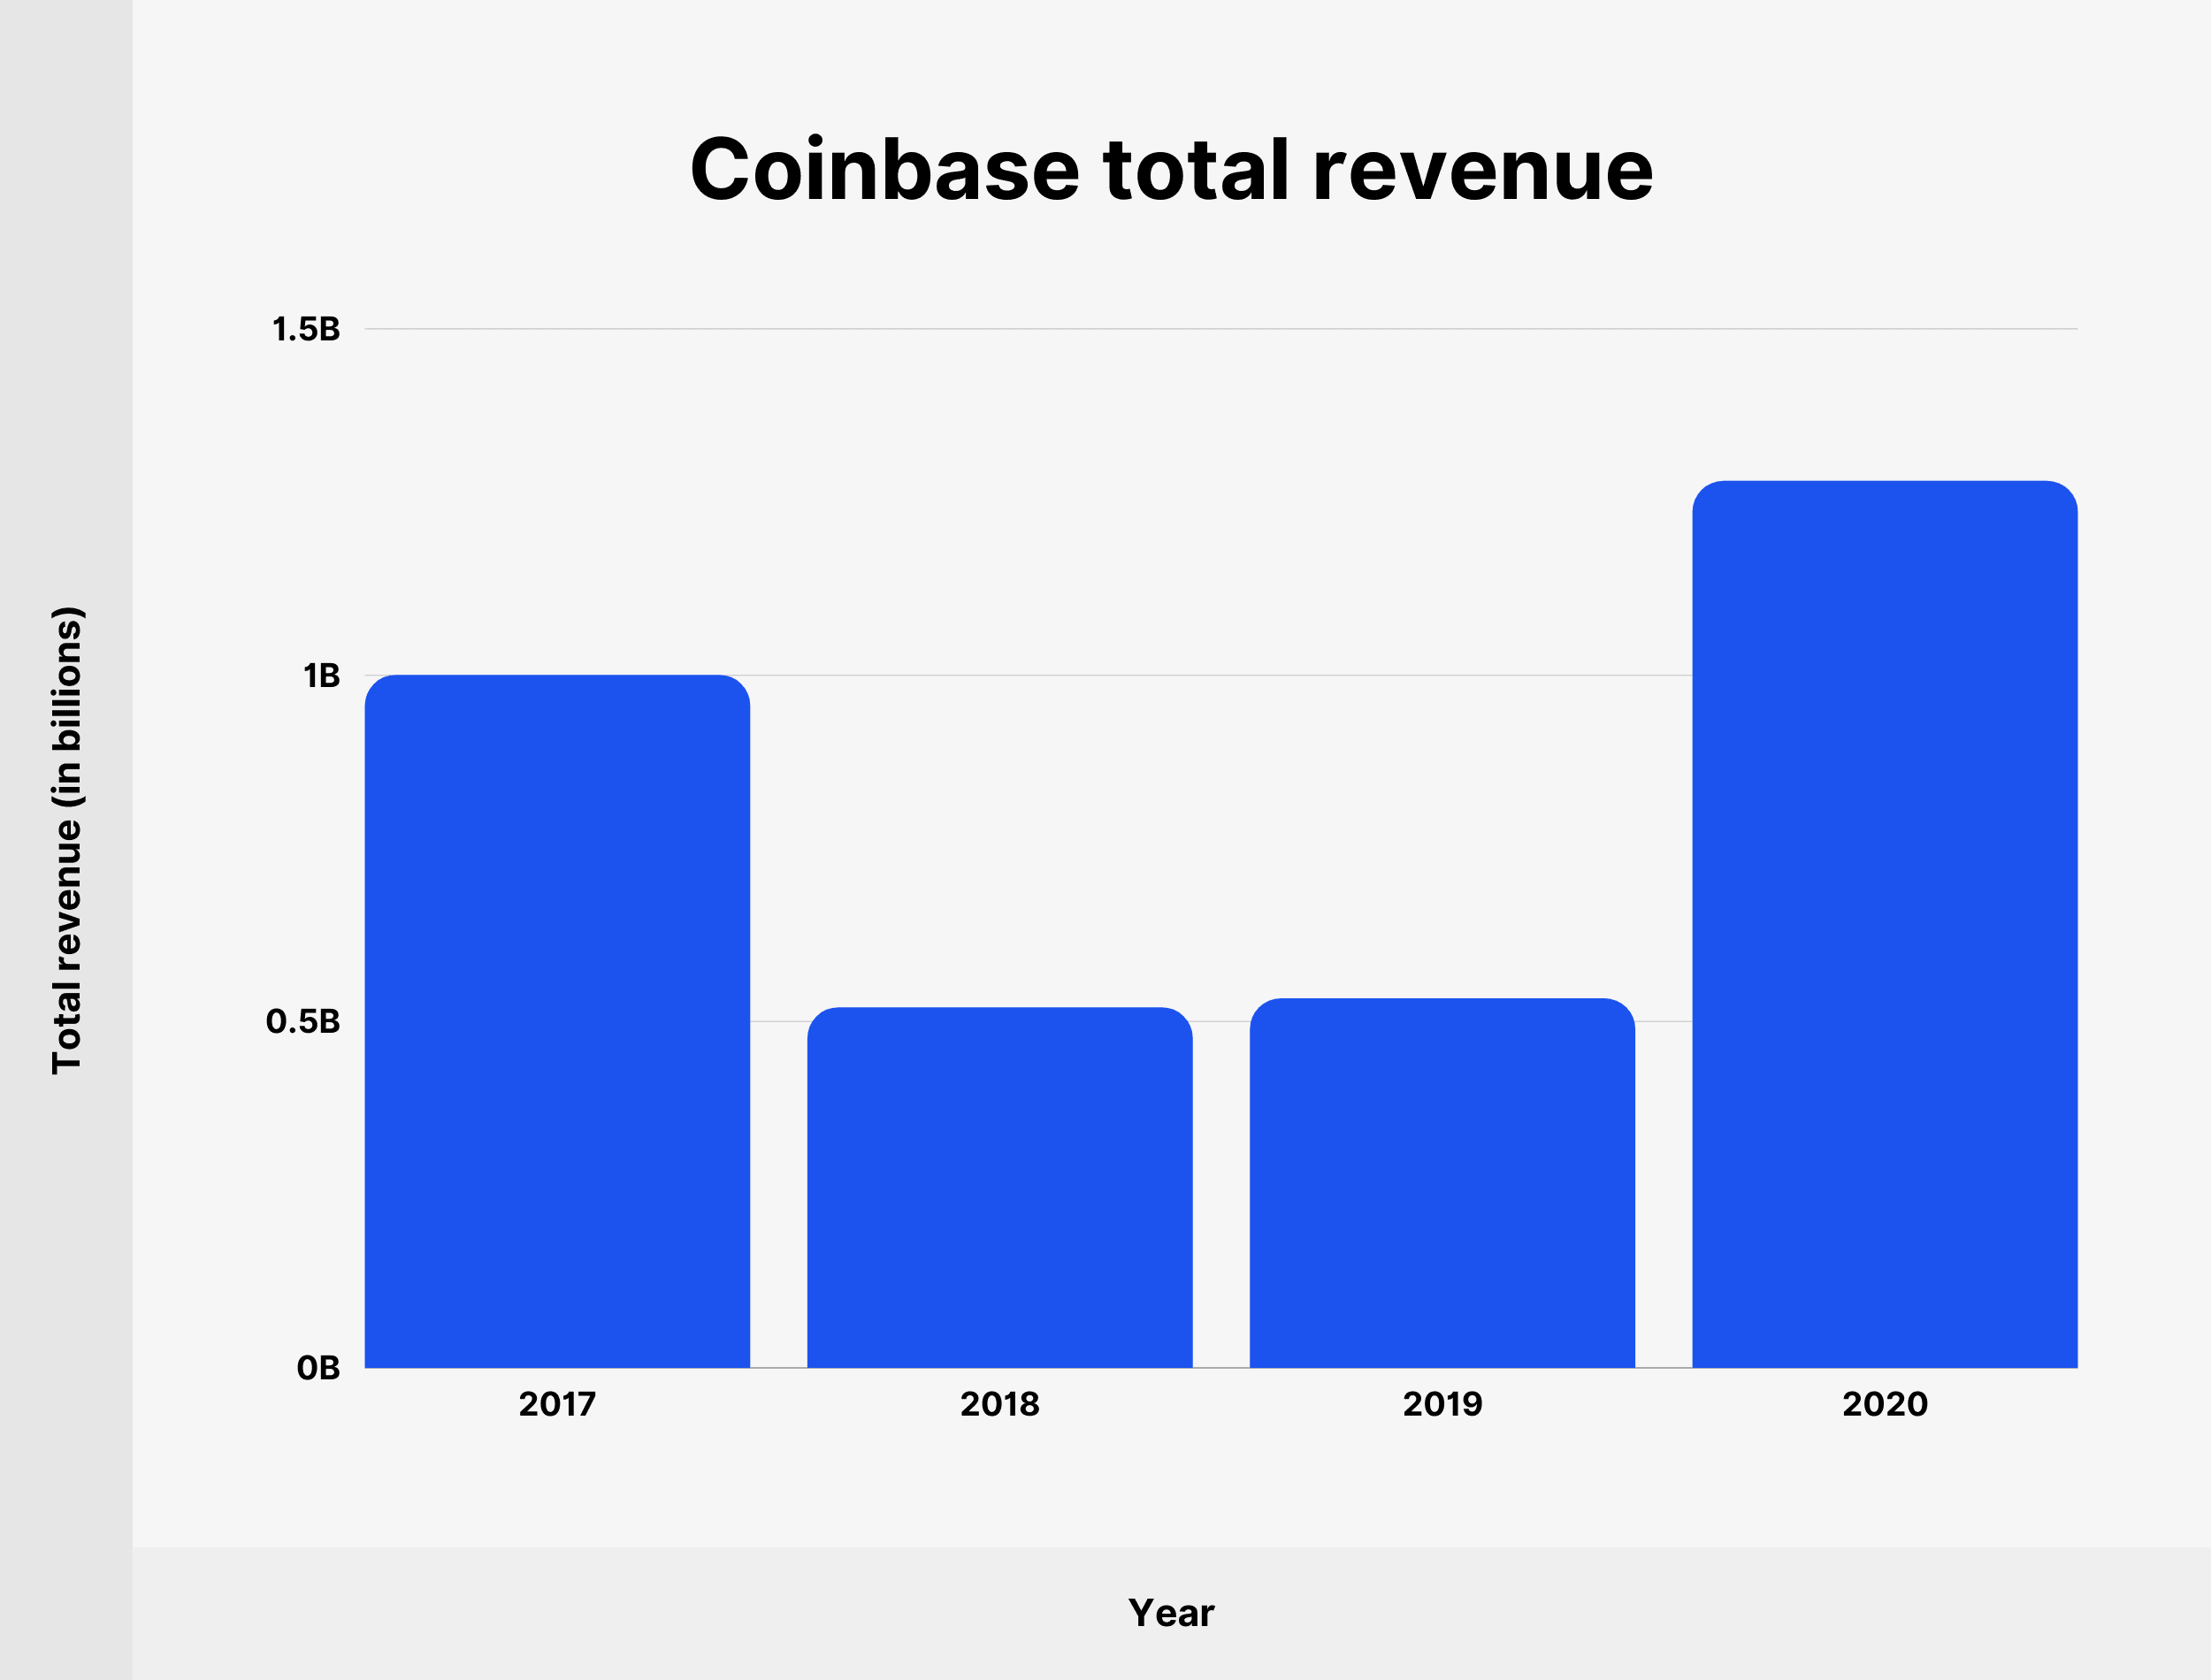 Coinbase total revenue